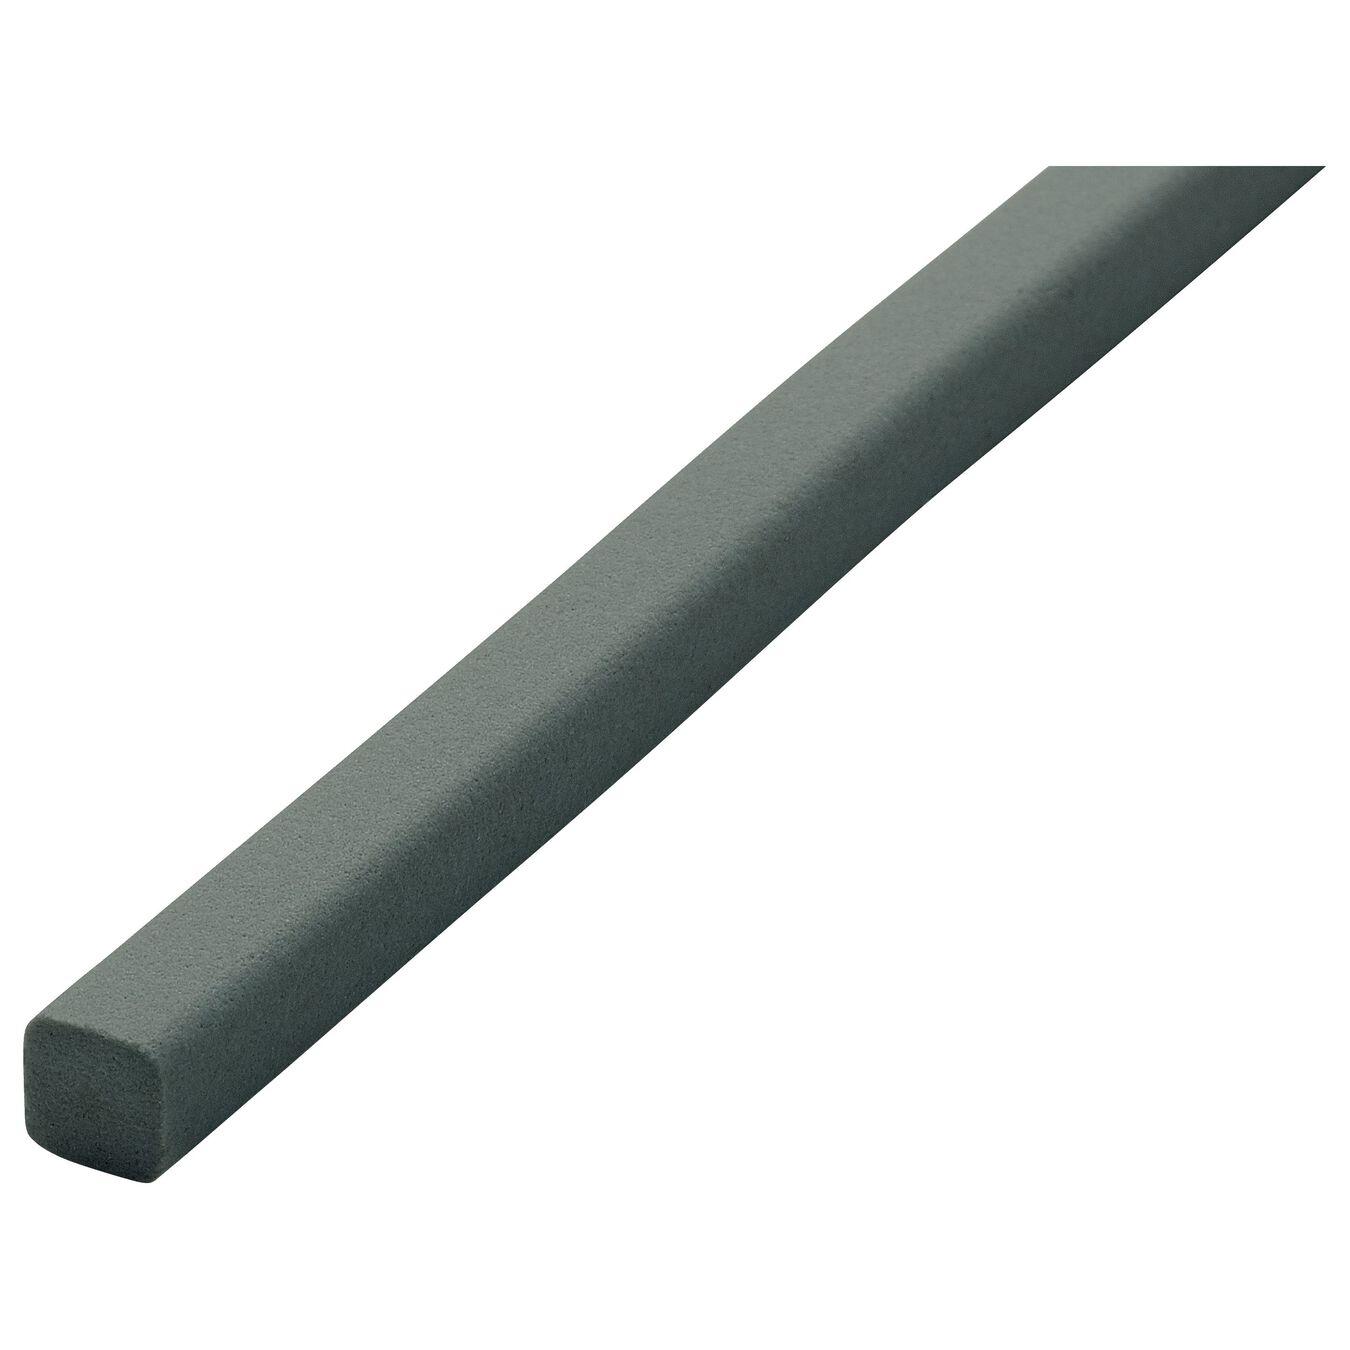 Affilacoltelli - 8 cm, ABS, nero,,large 5